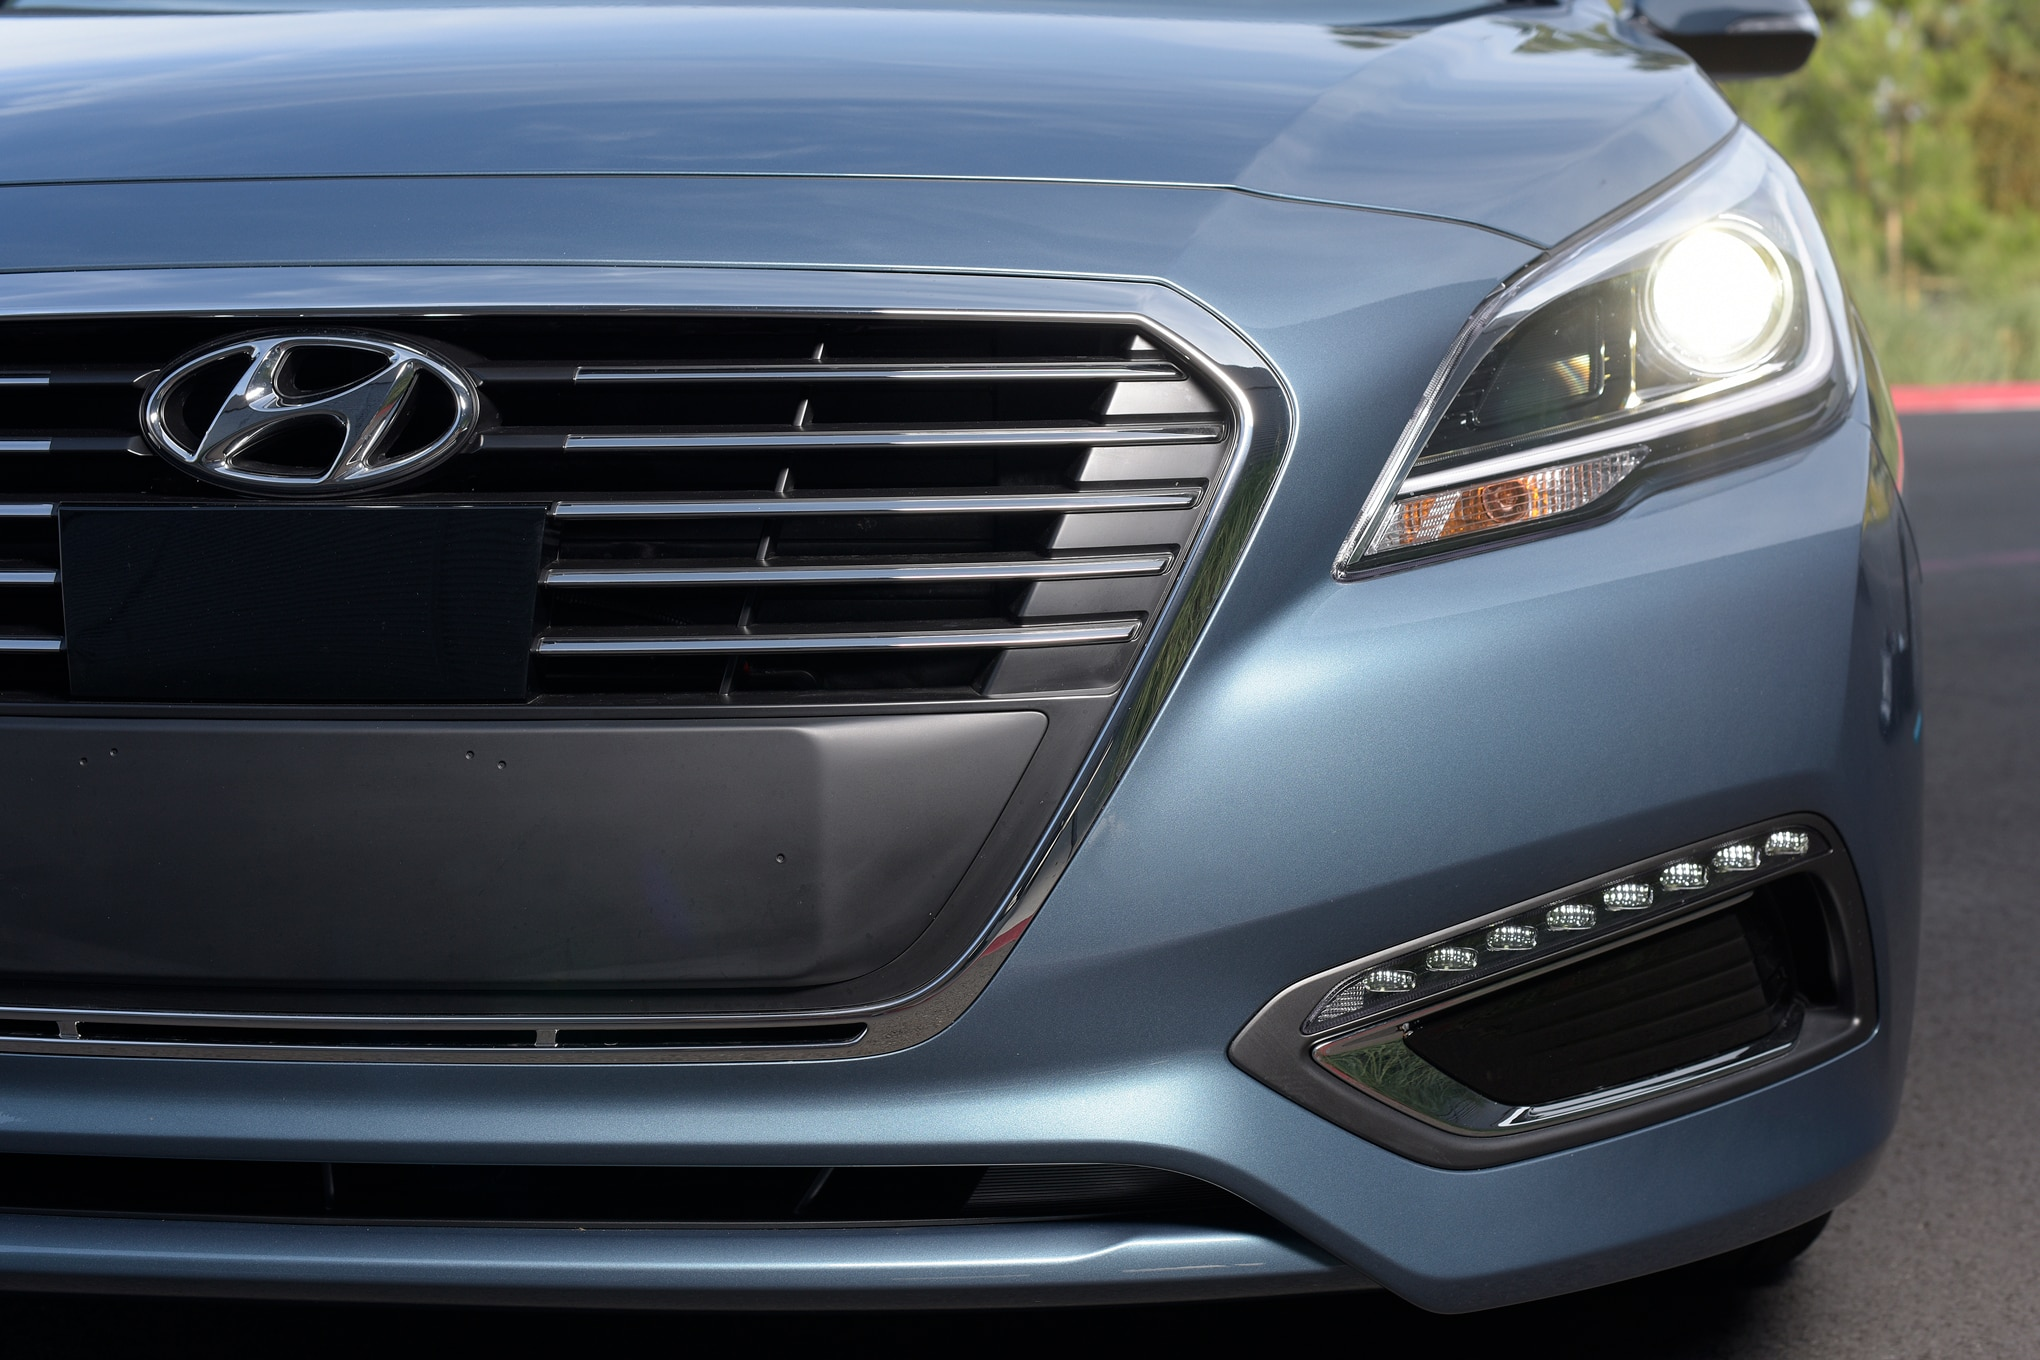 2016 Hyundai Sonata Hybrid Front Grille